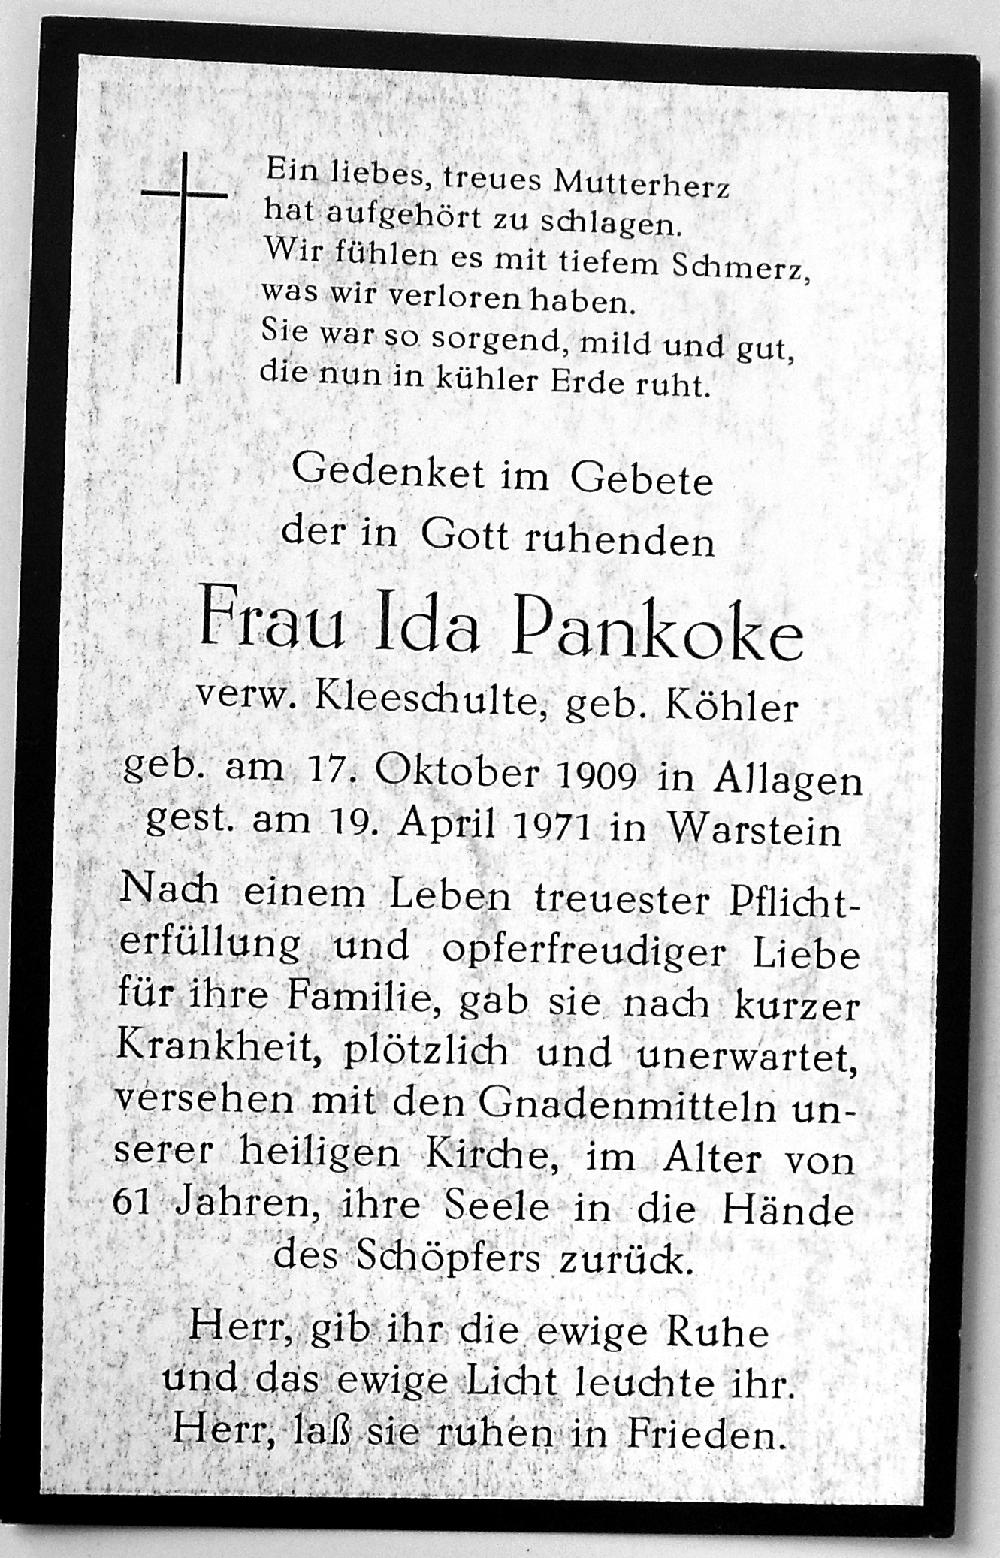 TZ_Koehler_Ida_1909-1971_Kleeschulte_Pankoke